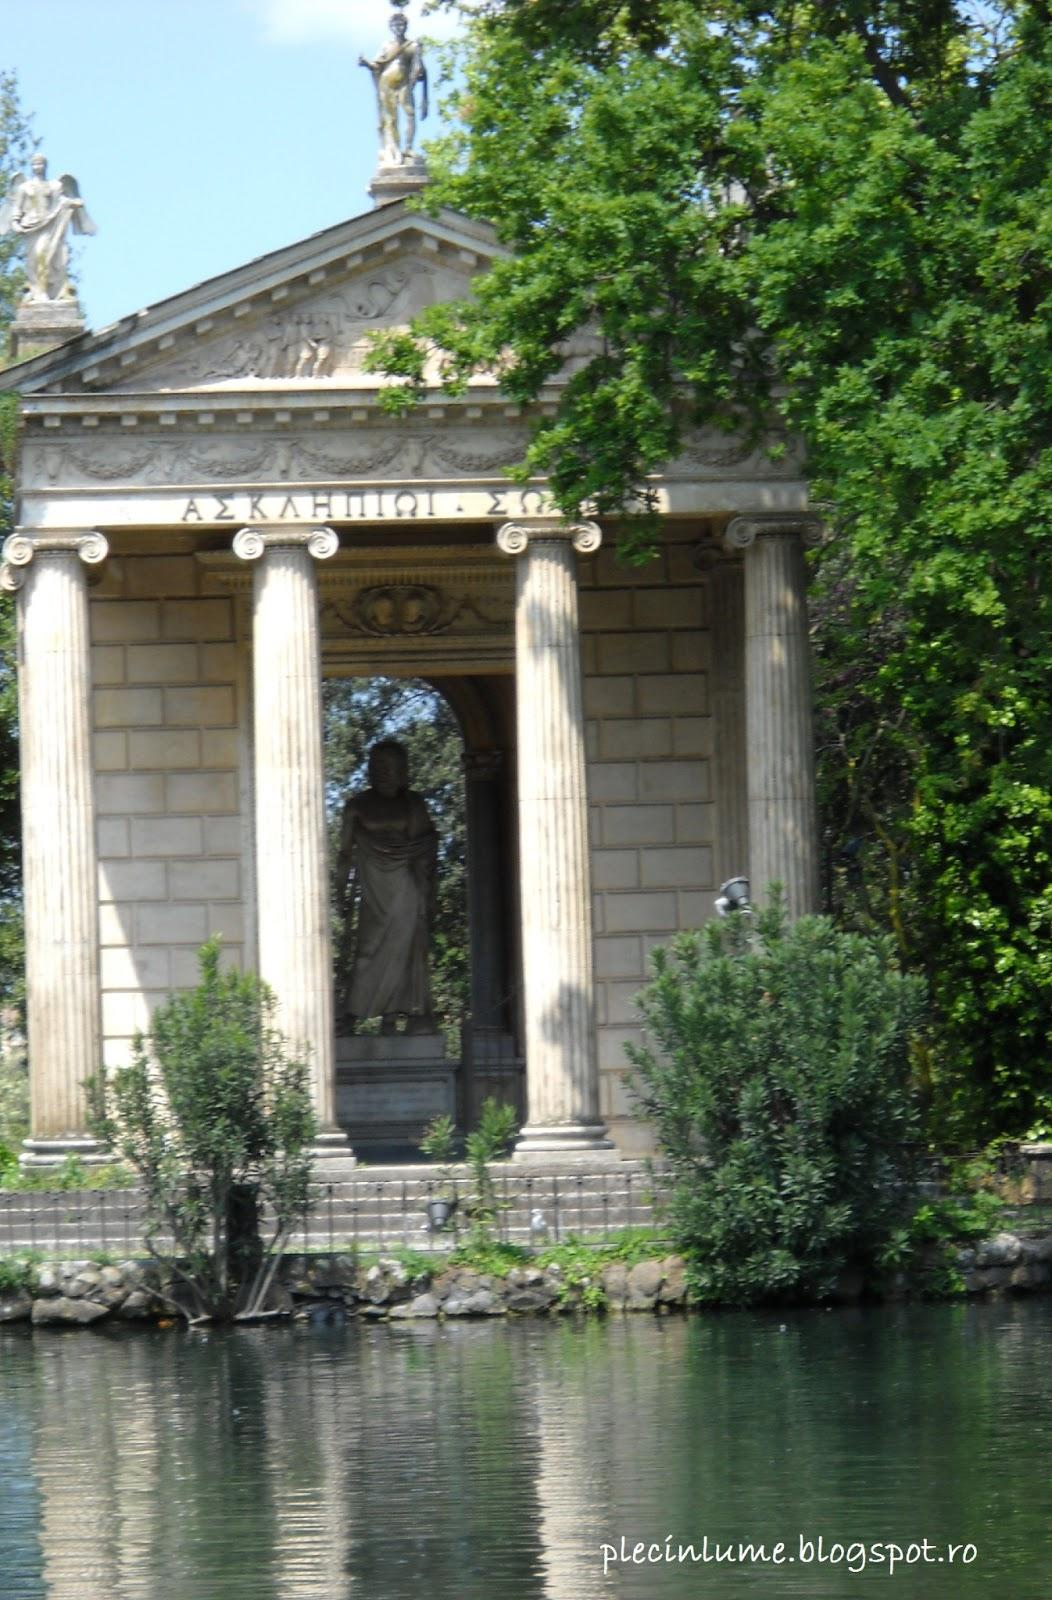 Templul lui Esculap - Villa Borghese in Roma